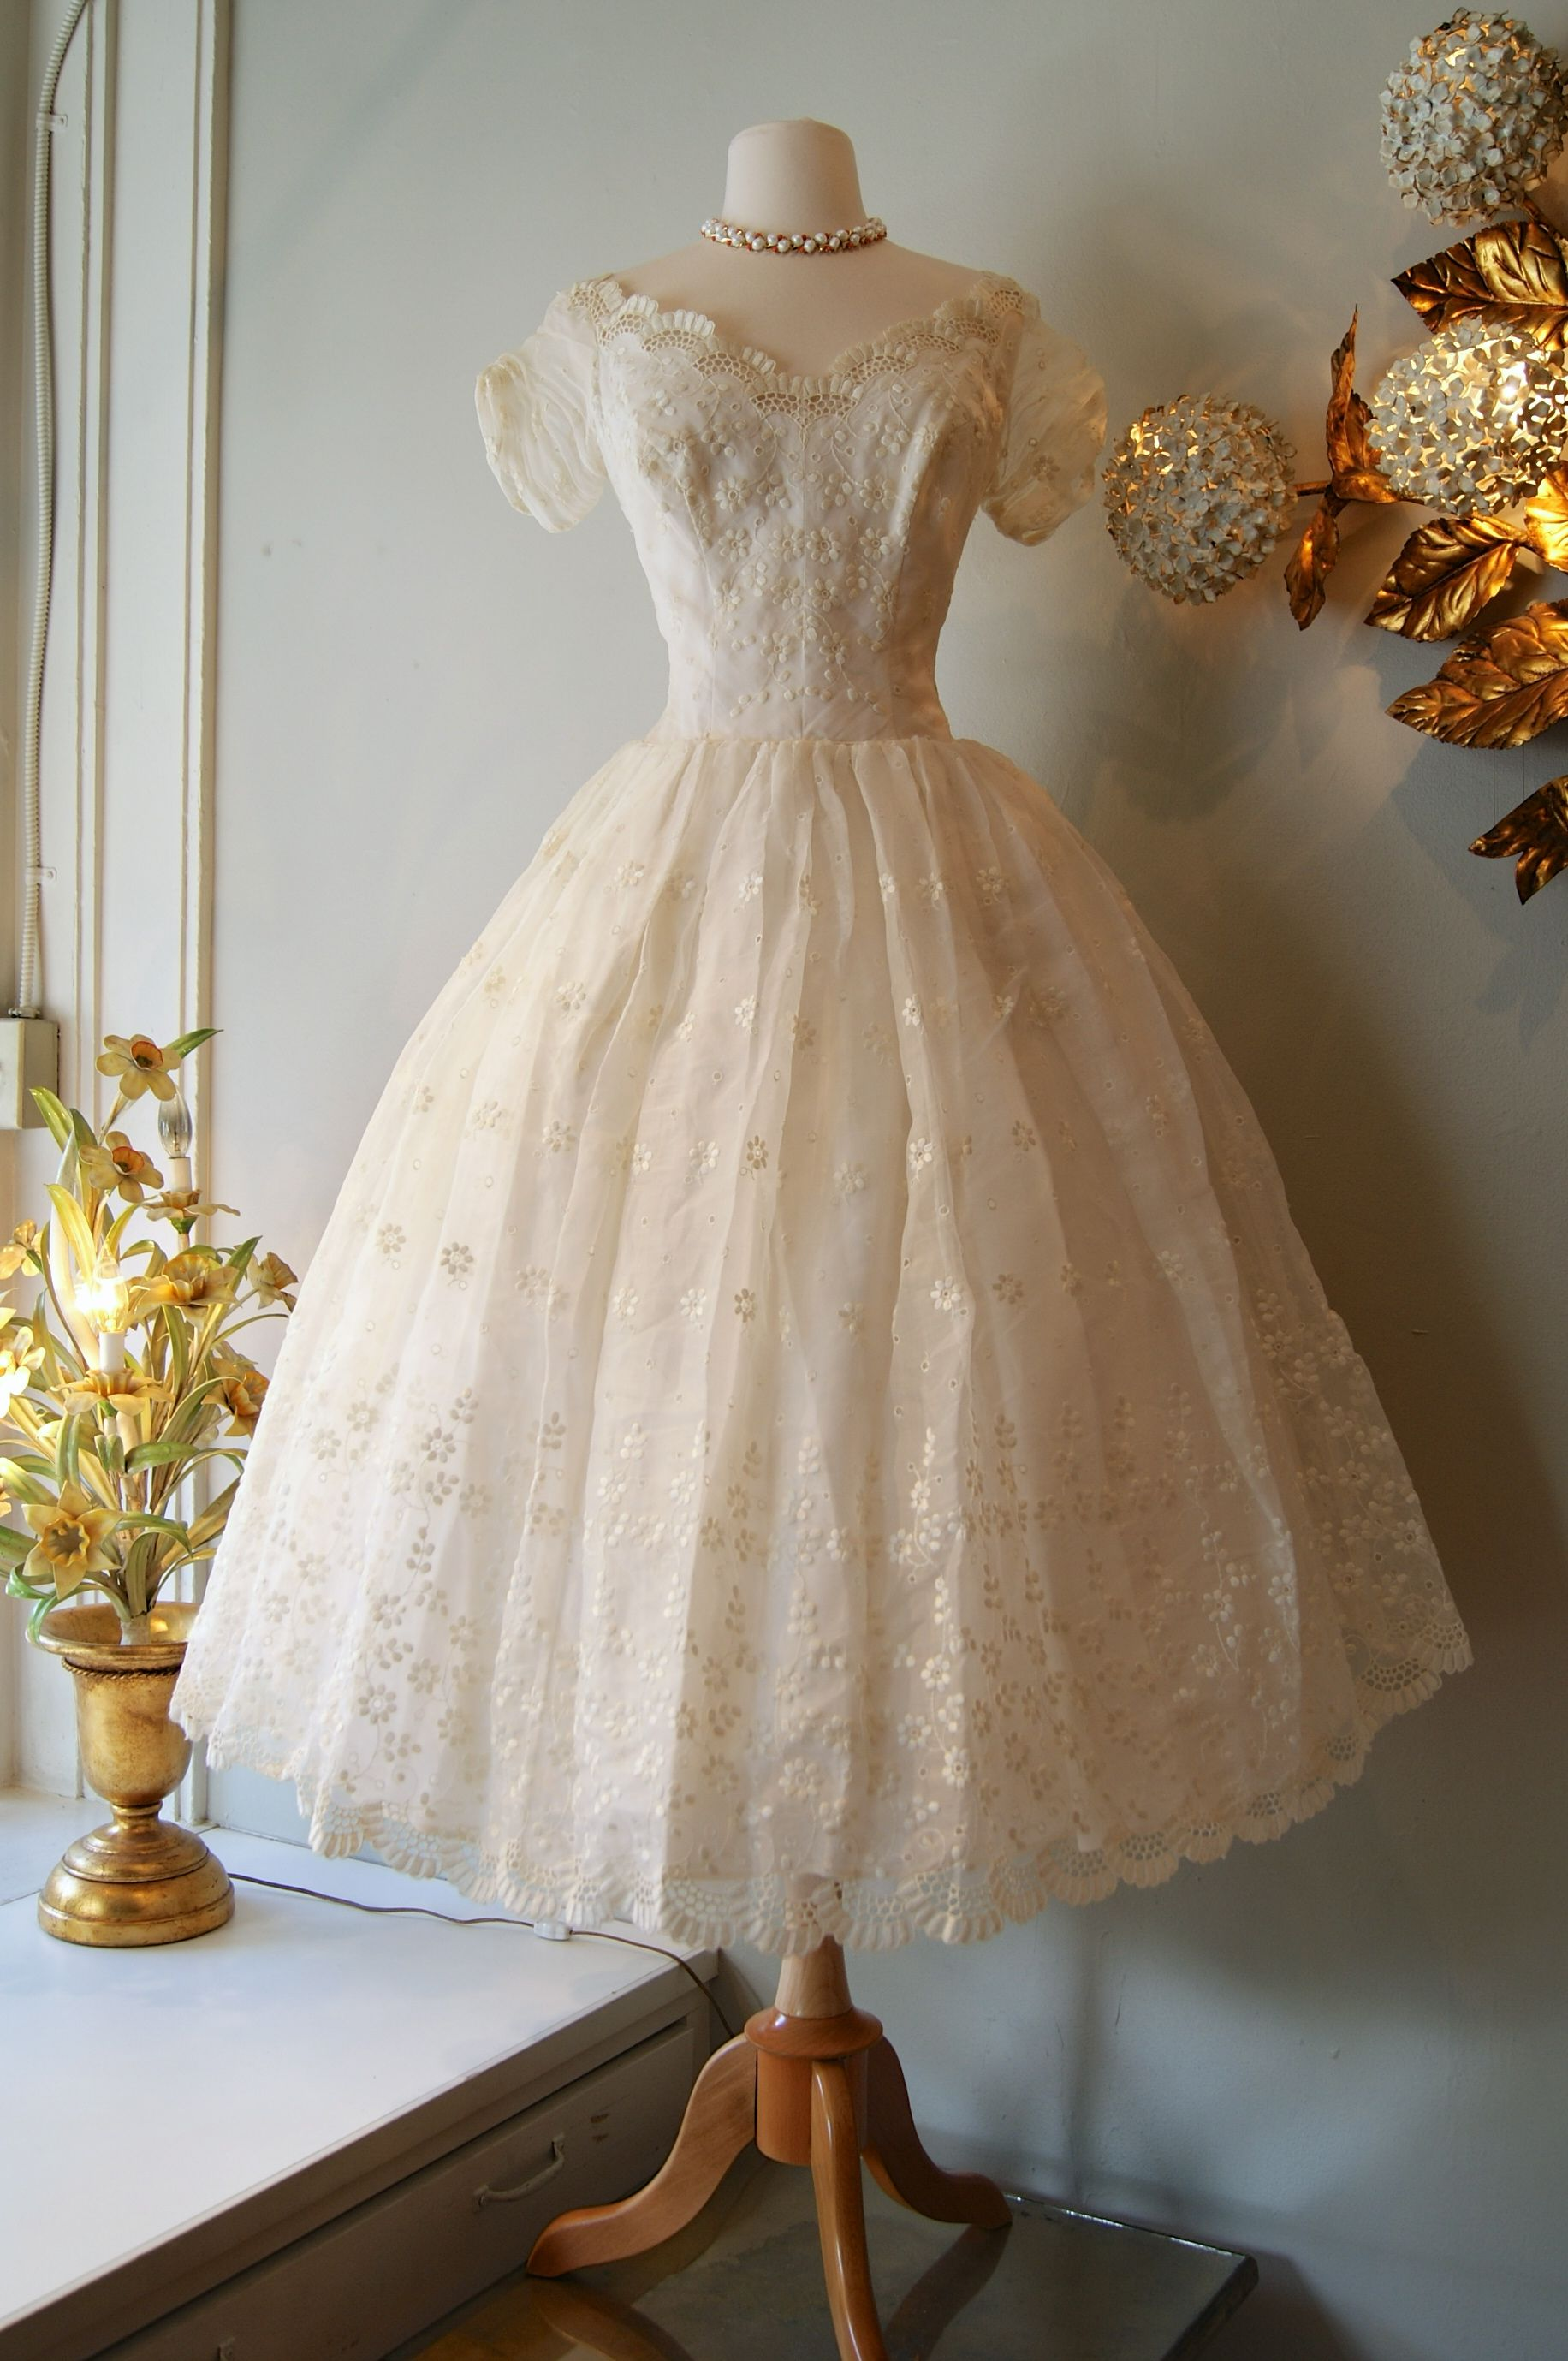 Us cotton eyelet wedding dress style pinterest